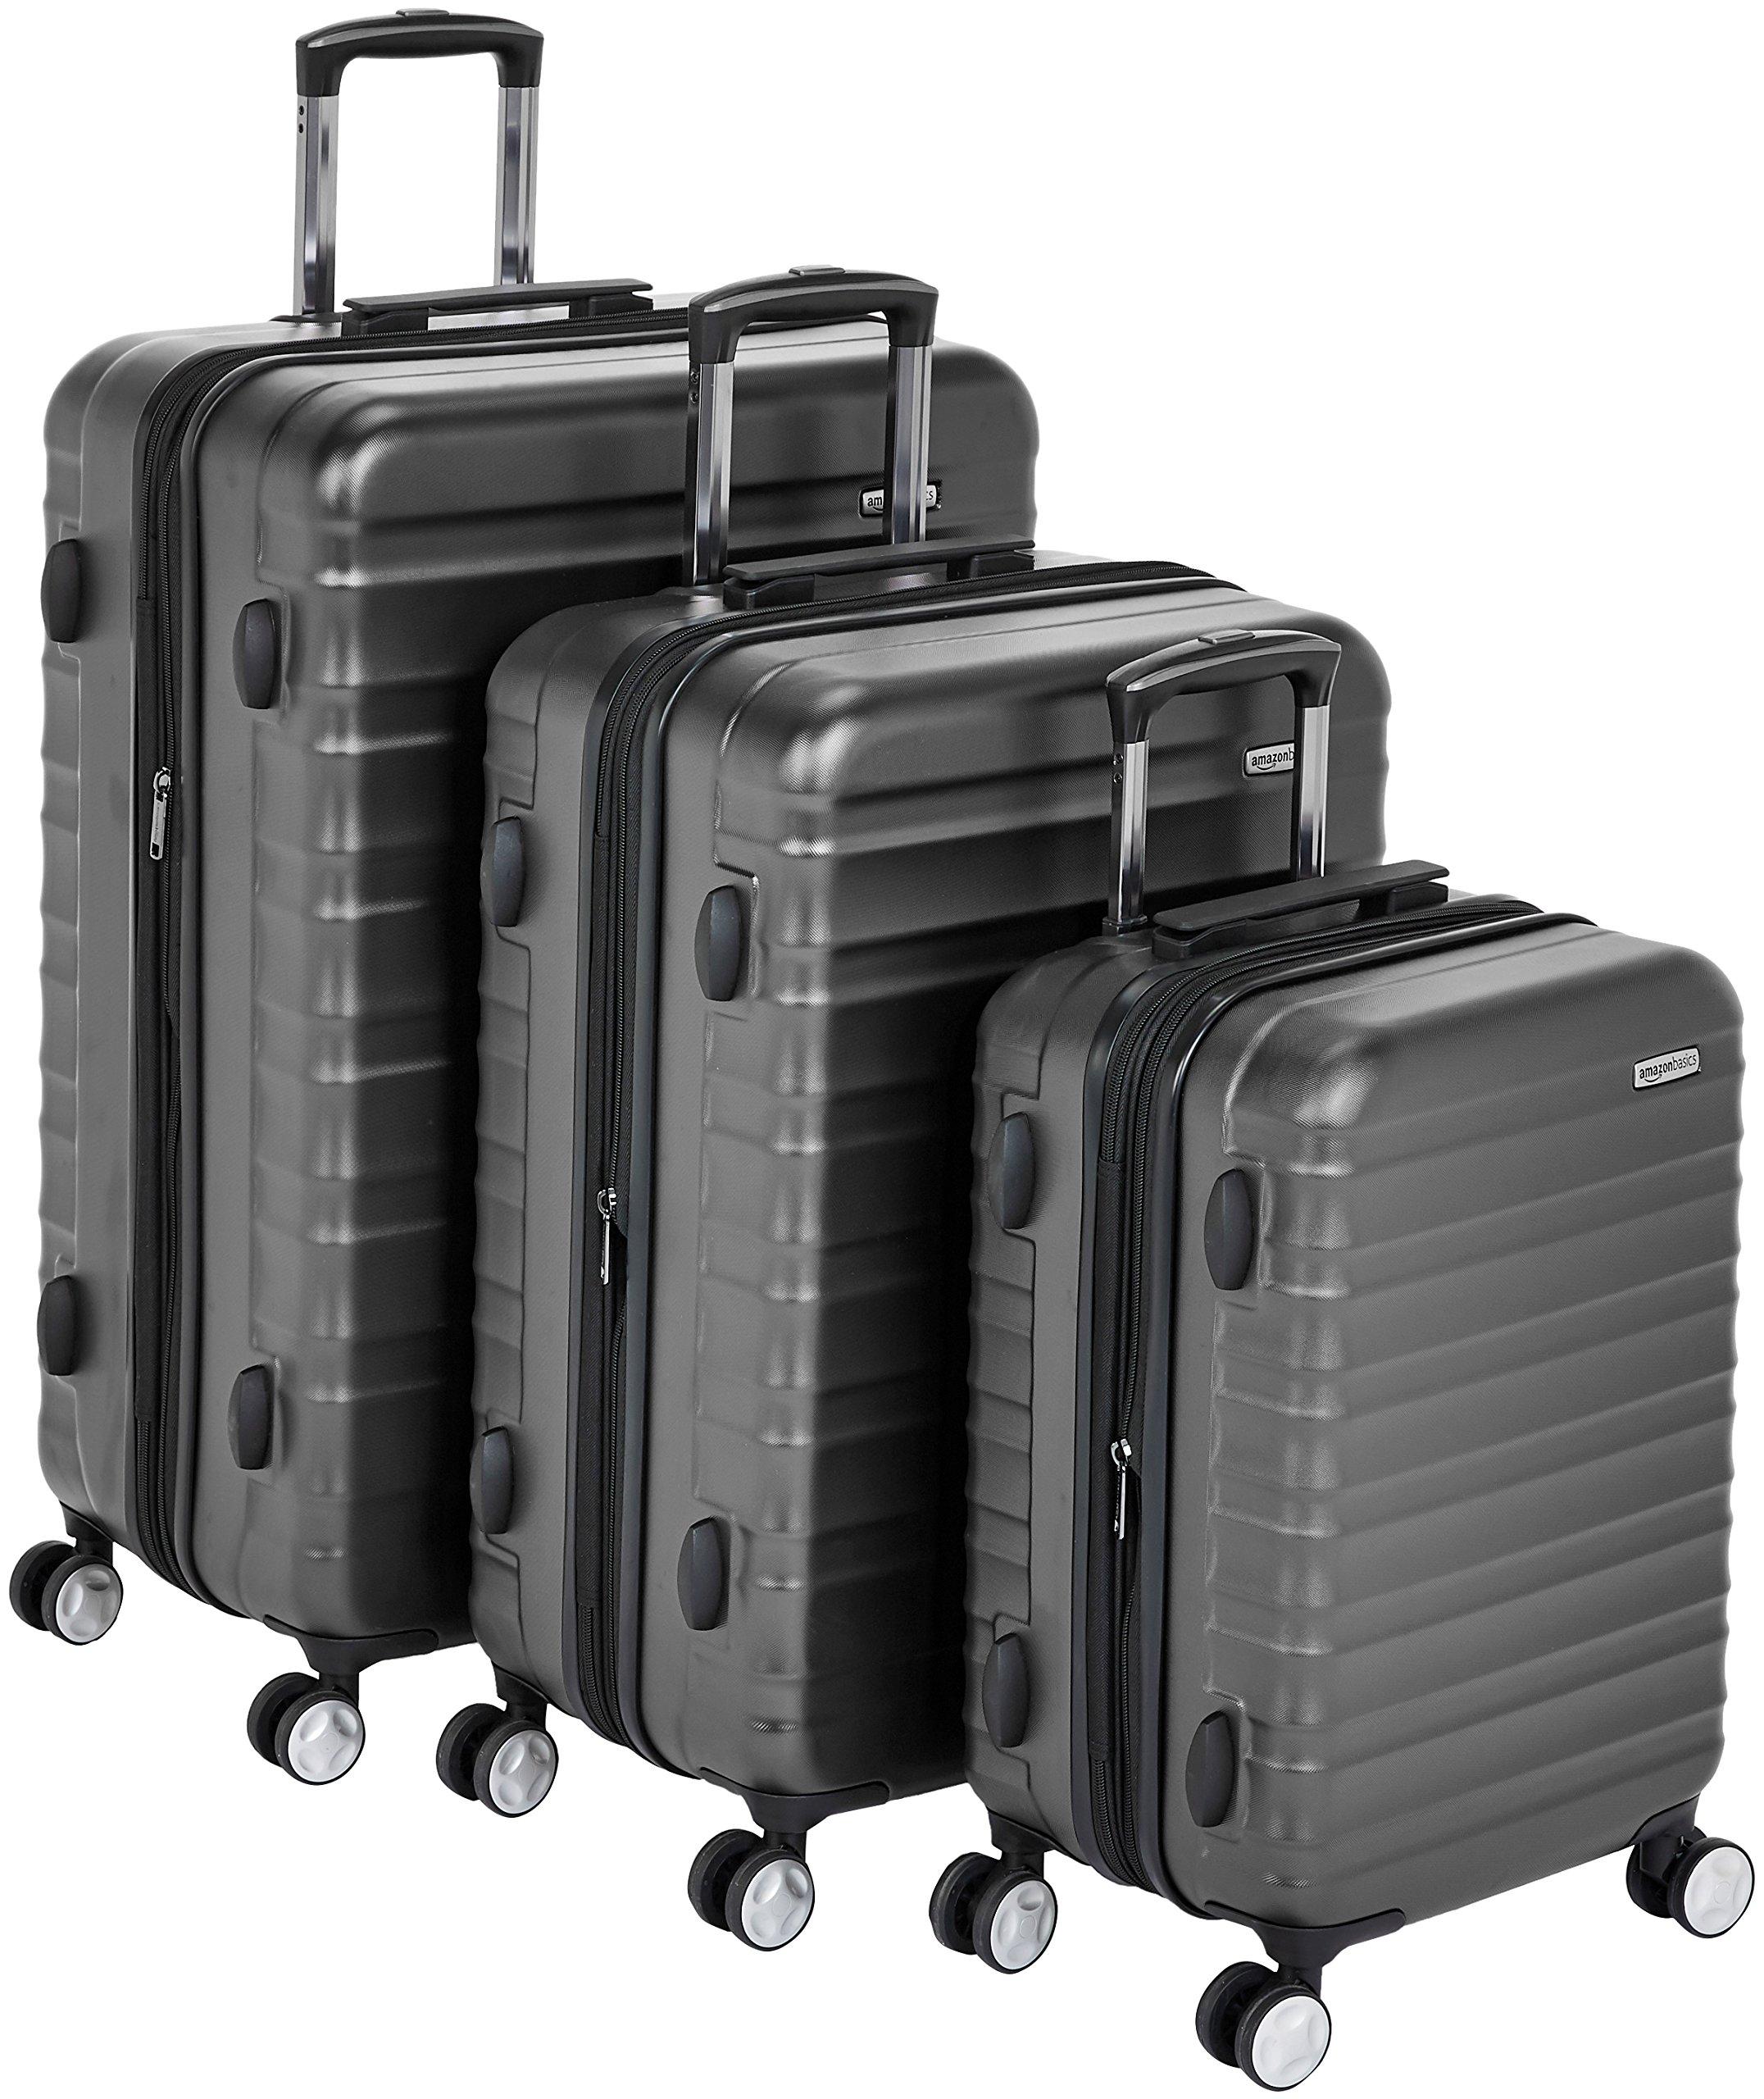 AmazonBasics Premium Hardside Spinner Luggage with Built-In TSA Lock - 3-Piece Set (20'', 24'', 28''), Black